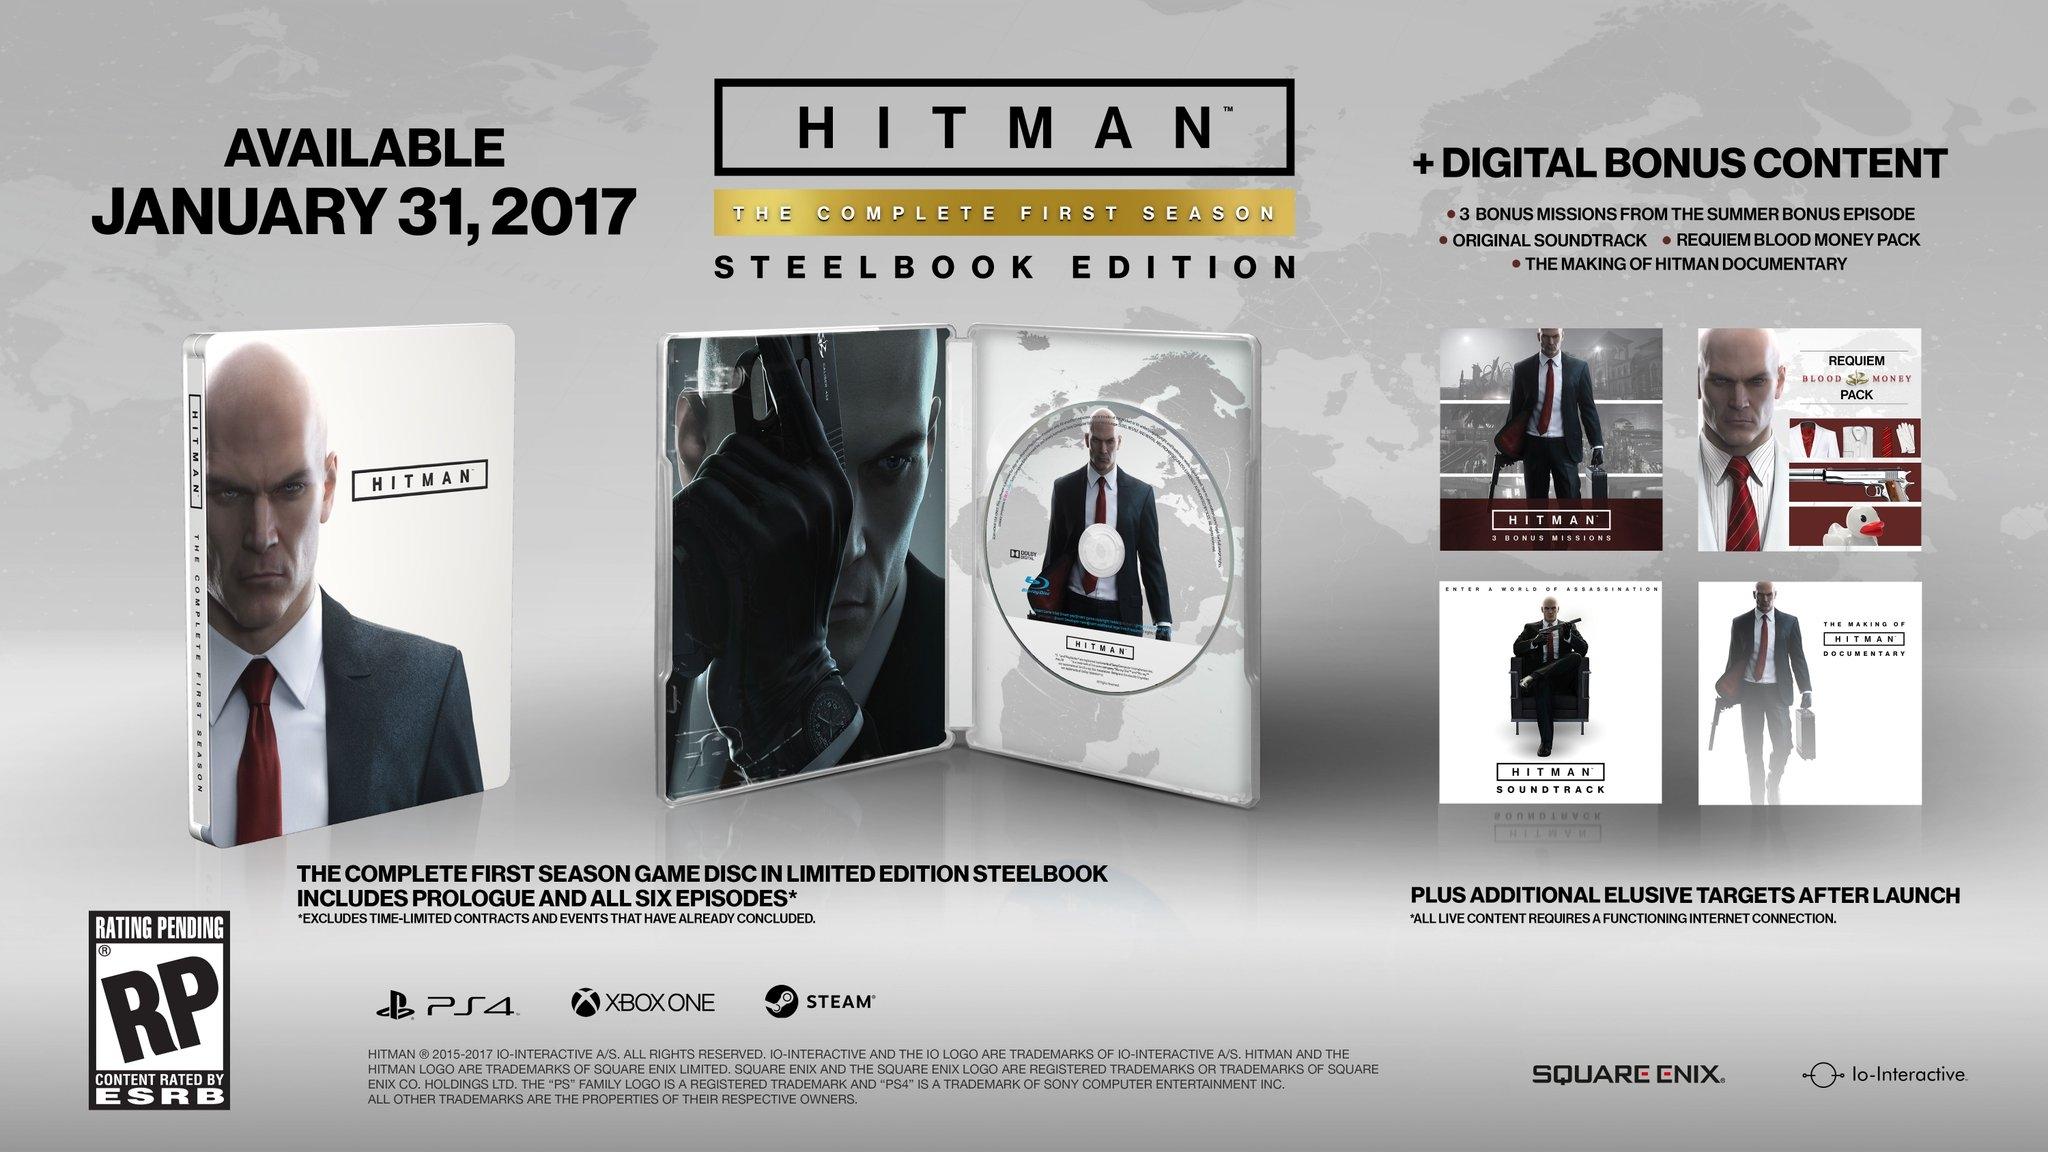 Hitman - Steelbook Edition